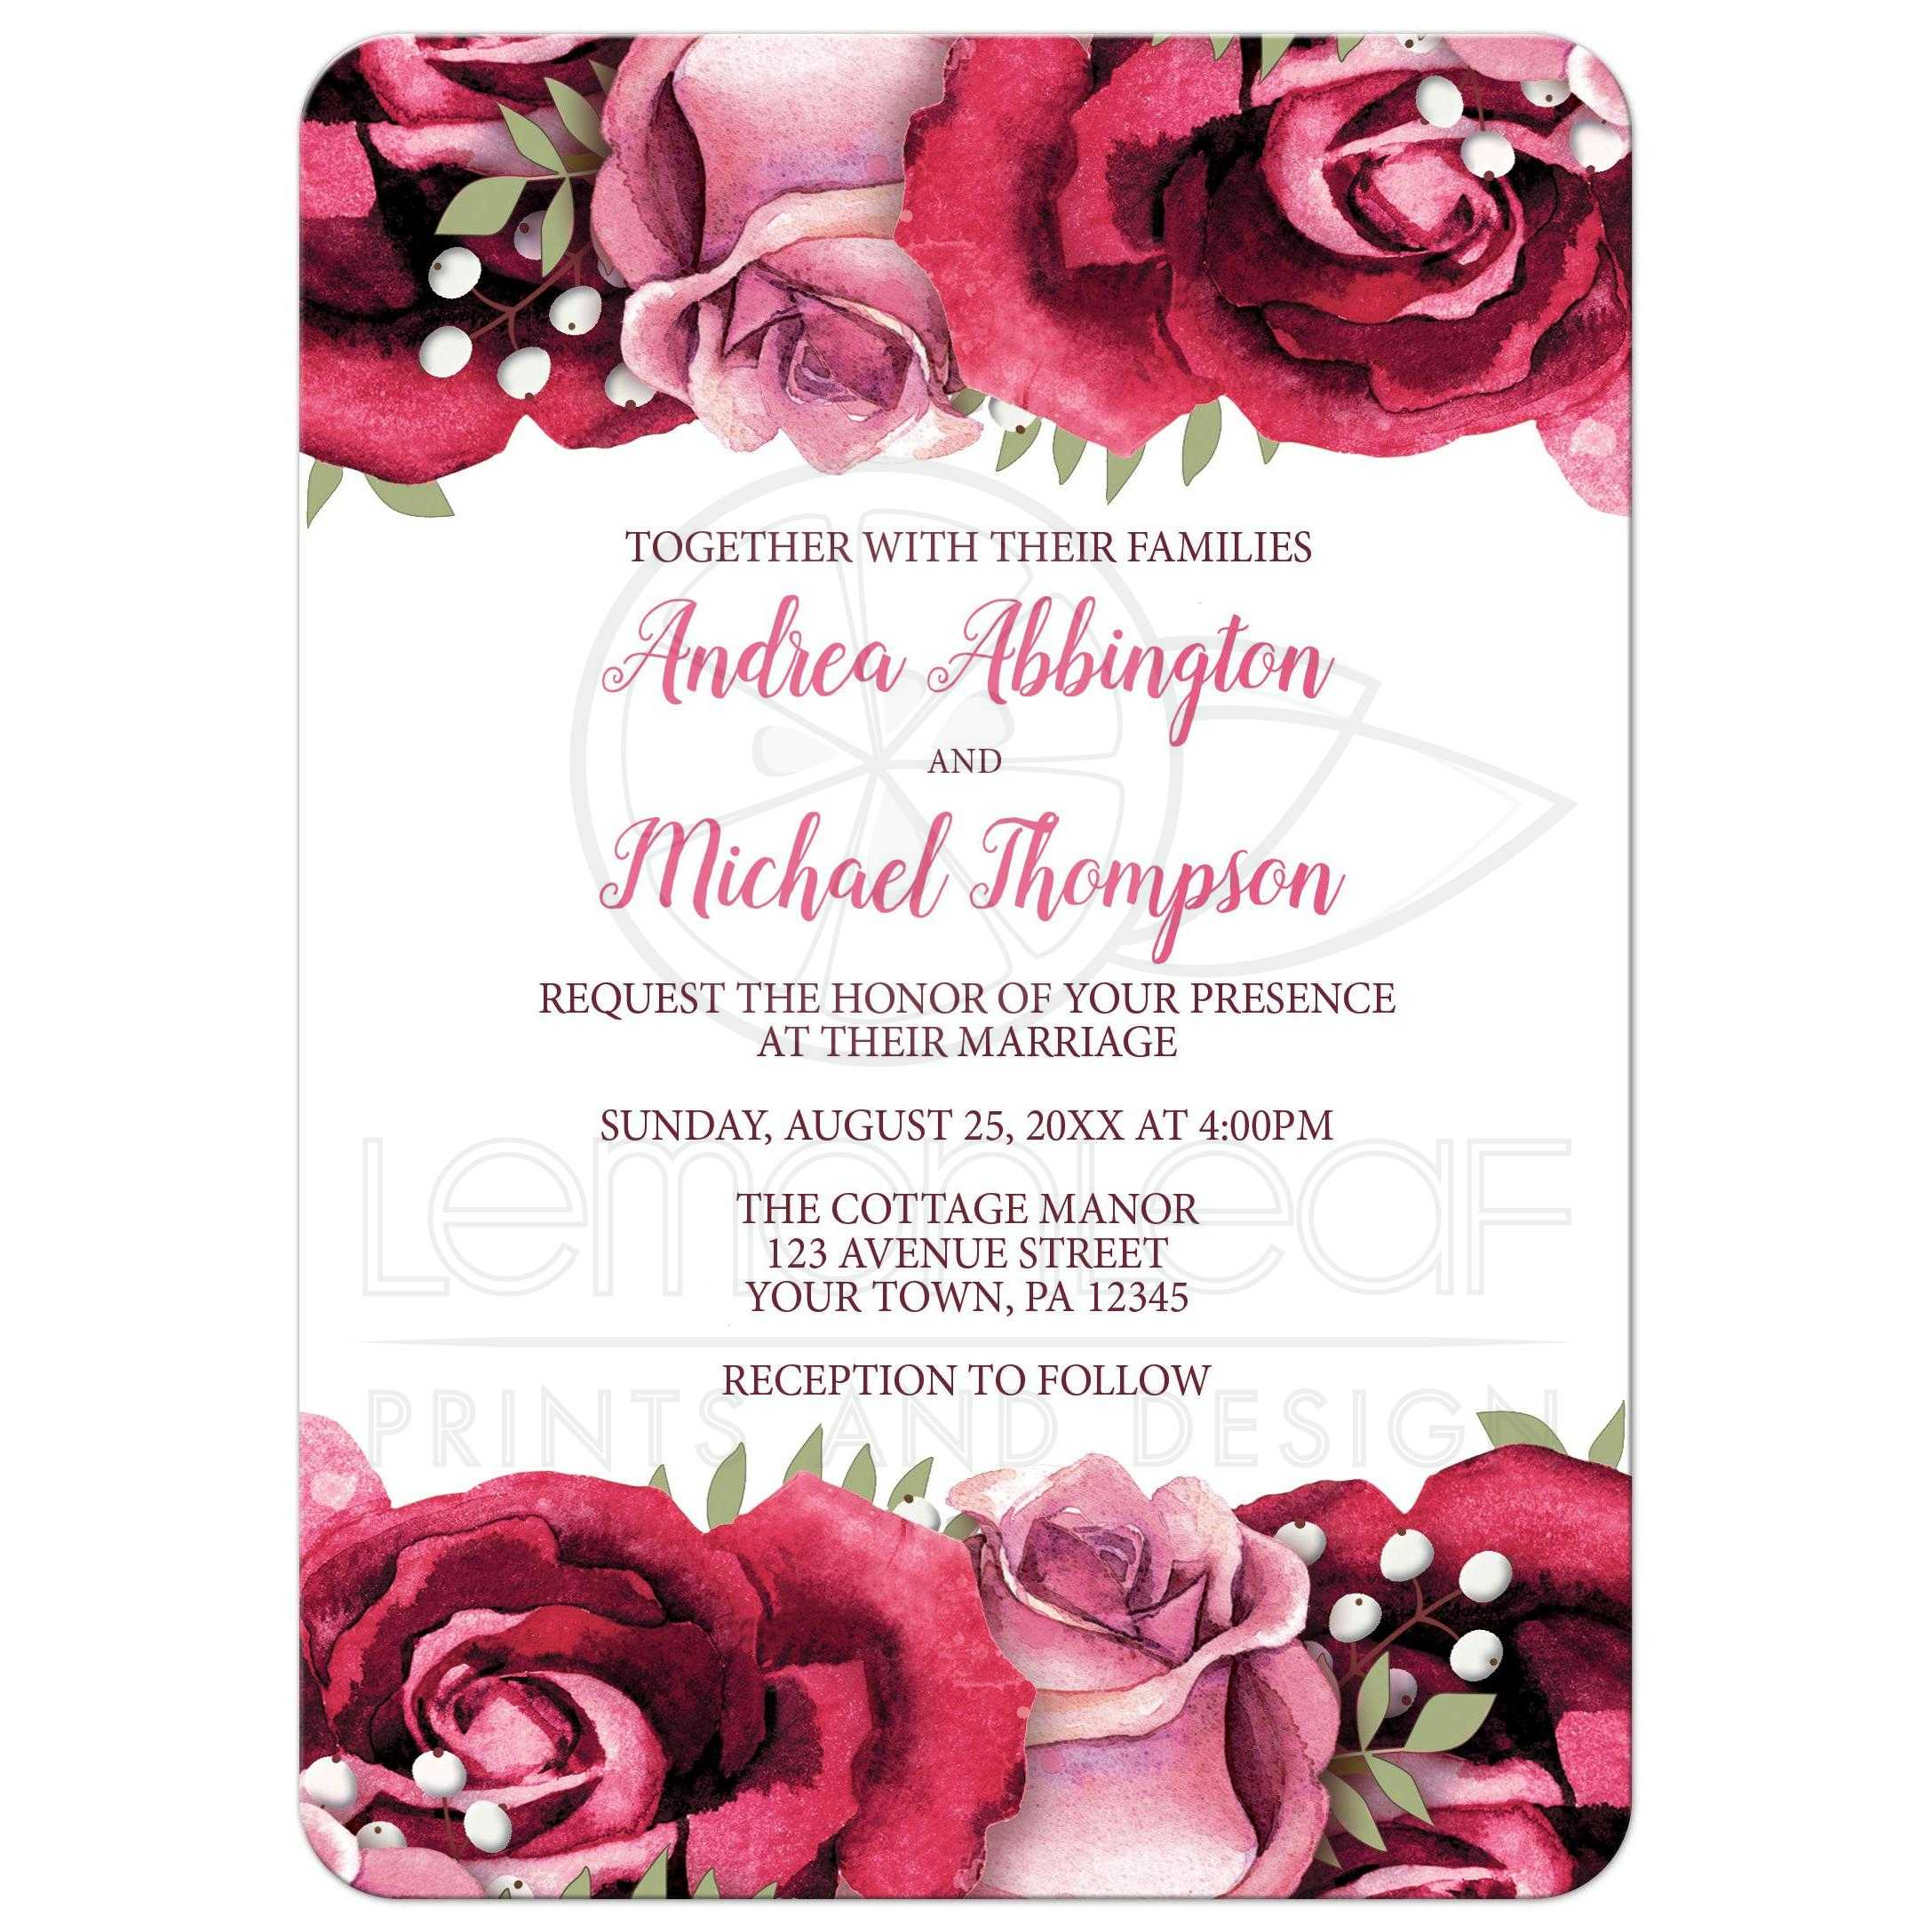 Invitations Burgundy Pink Rose White Rustic